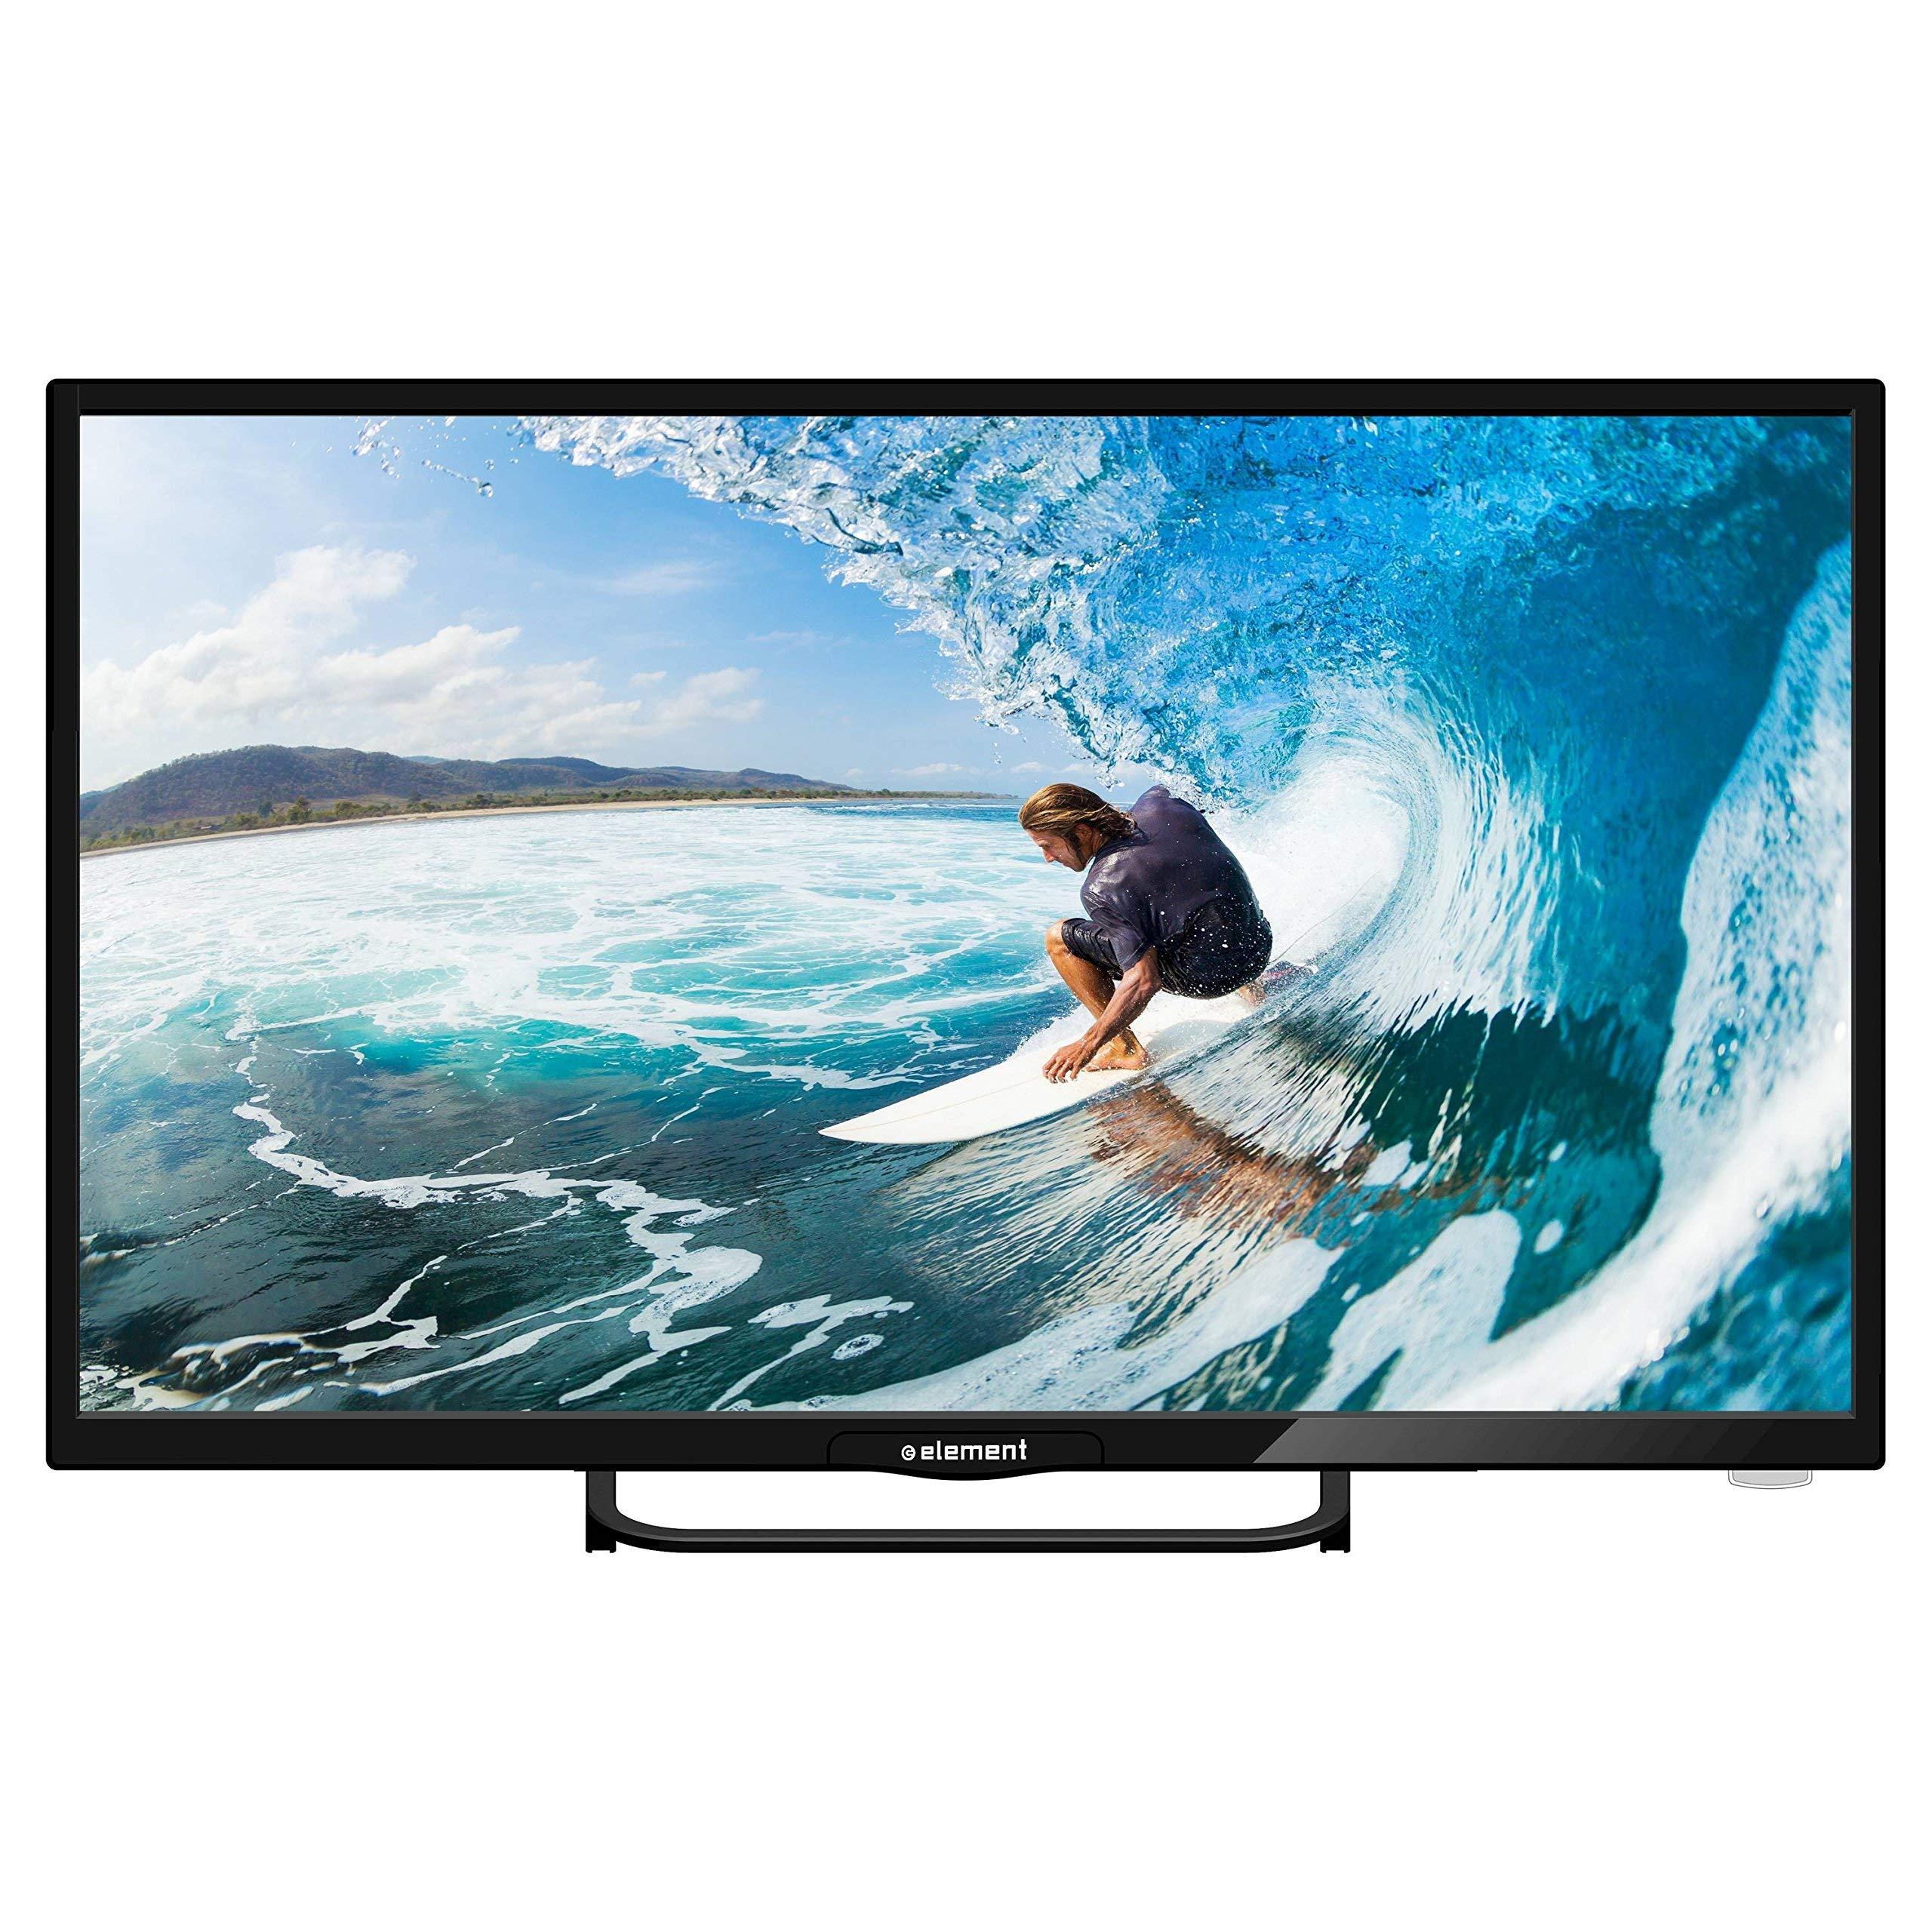 ELEMENT Electronic ELST3216H 32inch Smart 720p 60Hz LED HD TV (Renewed)